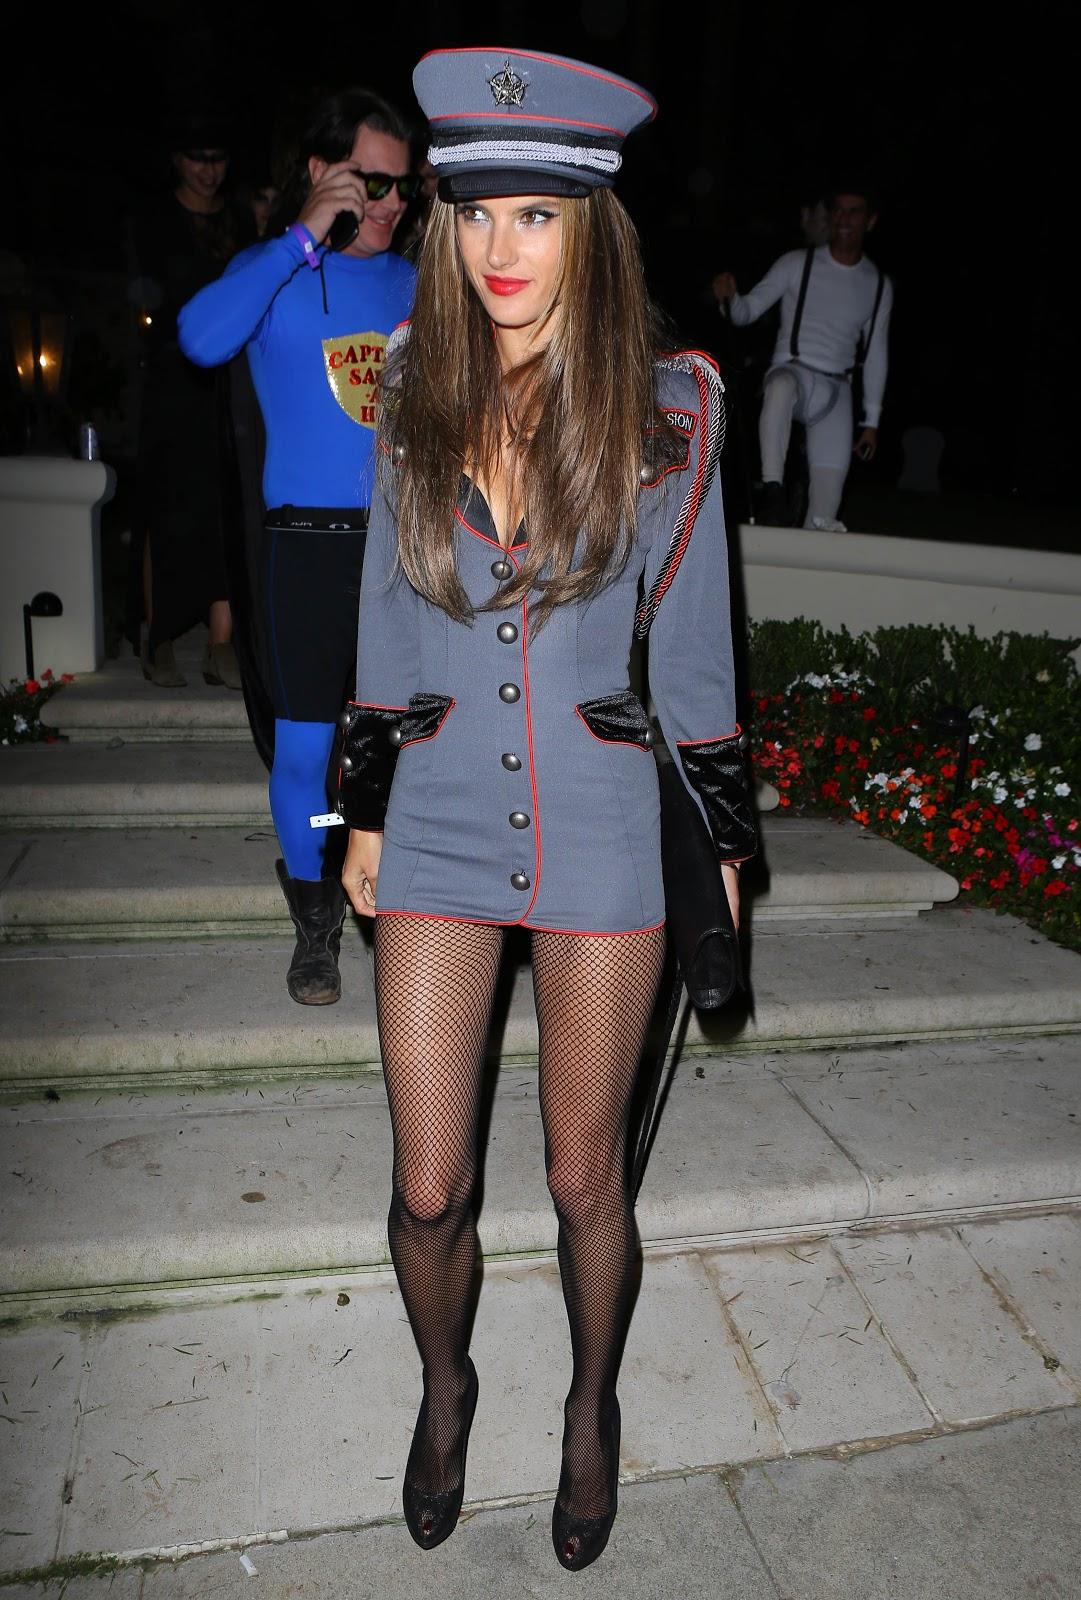 http://3.bp.blogspot.com/-NCrhoXKfW7c/UIxnfO57CnI/AAAAAAAAWr0/Dts4EQ0P4kQ/s1600/Alessandra+Ambrosio+attending+a+Halloween+party+2012+in+Beverly+Hills.jpg